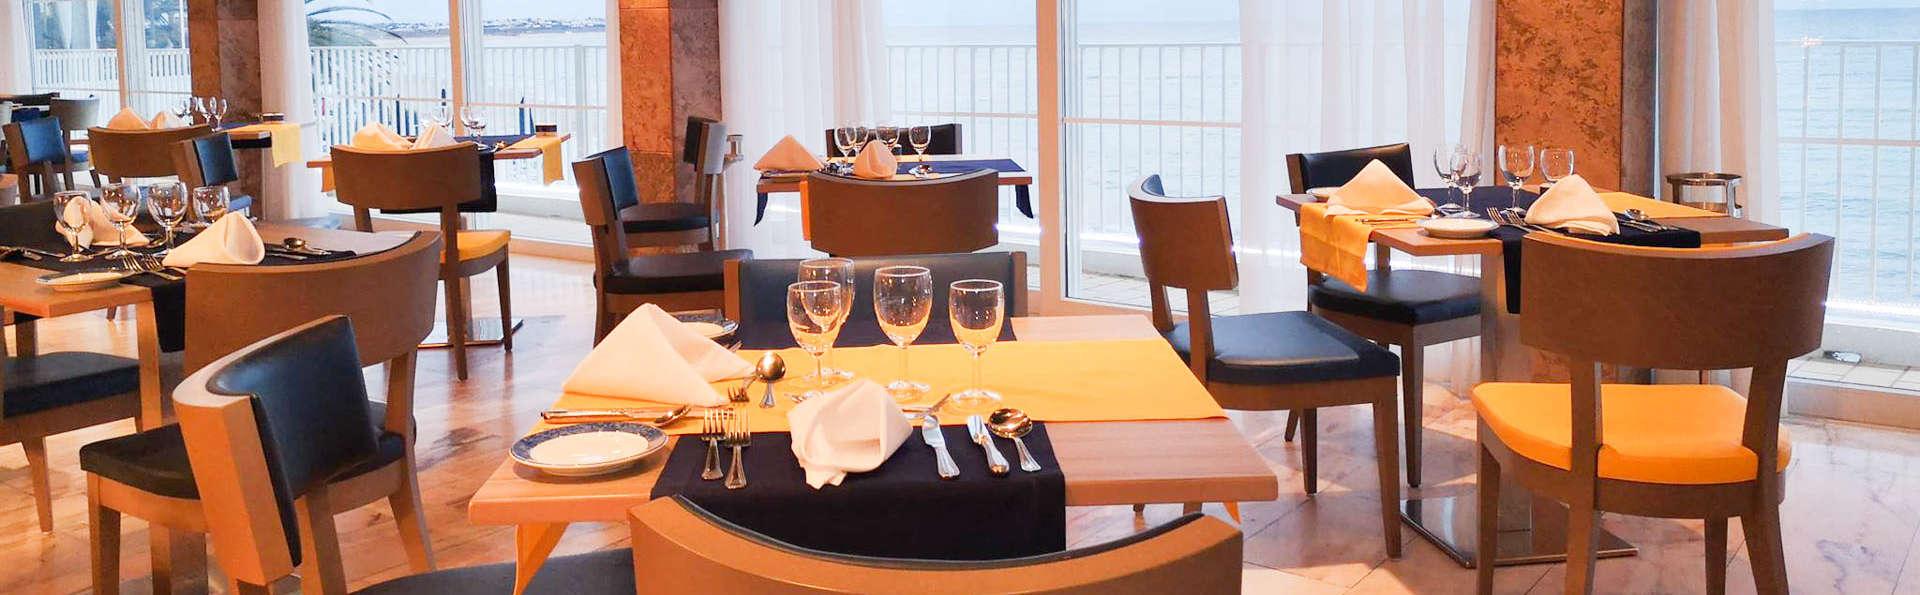 Holiday Inn Algarve - EDIT_N2_Restaurant.jpg